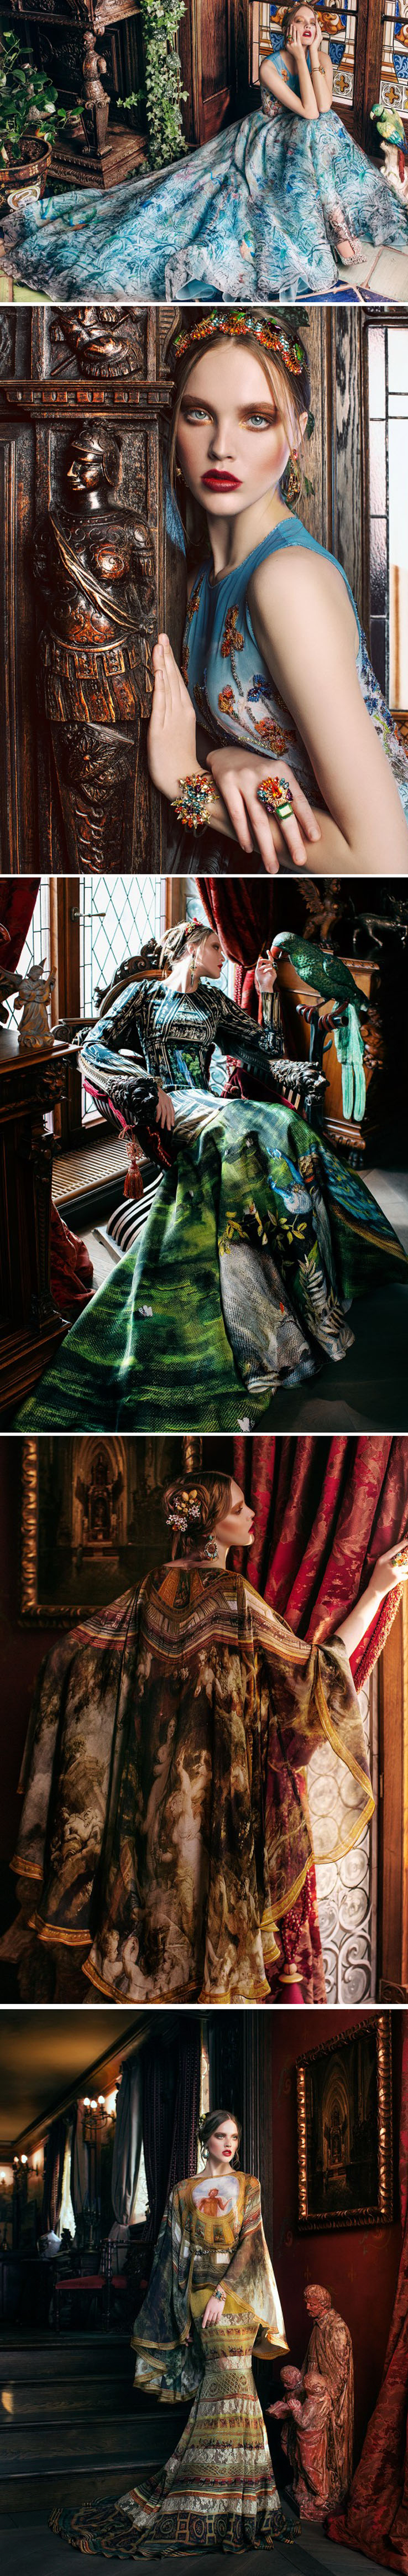 Vestidos de alta costura adornados com estampas de pinturas clássicas stylo urbano-2